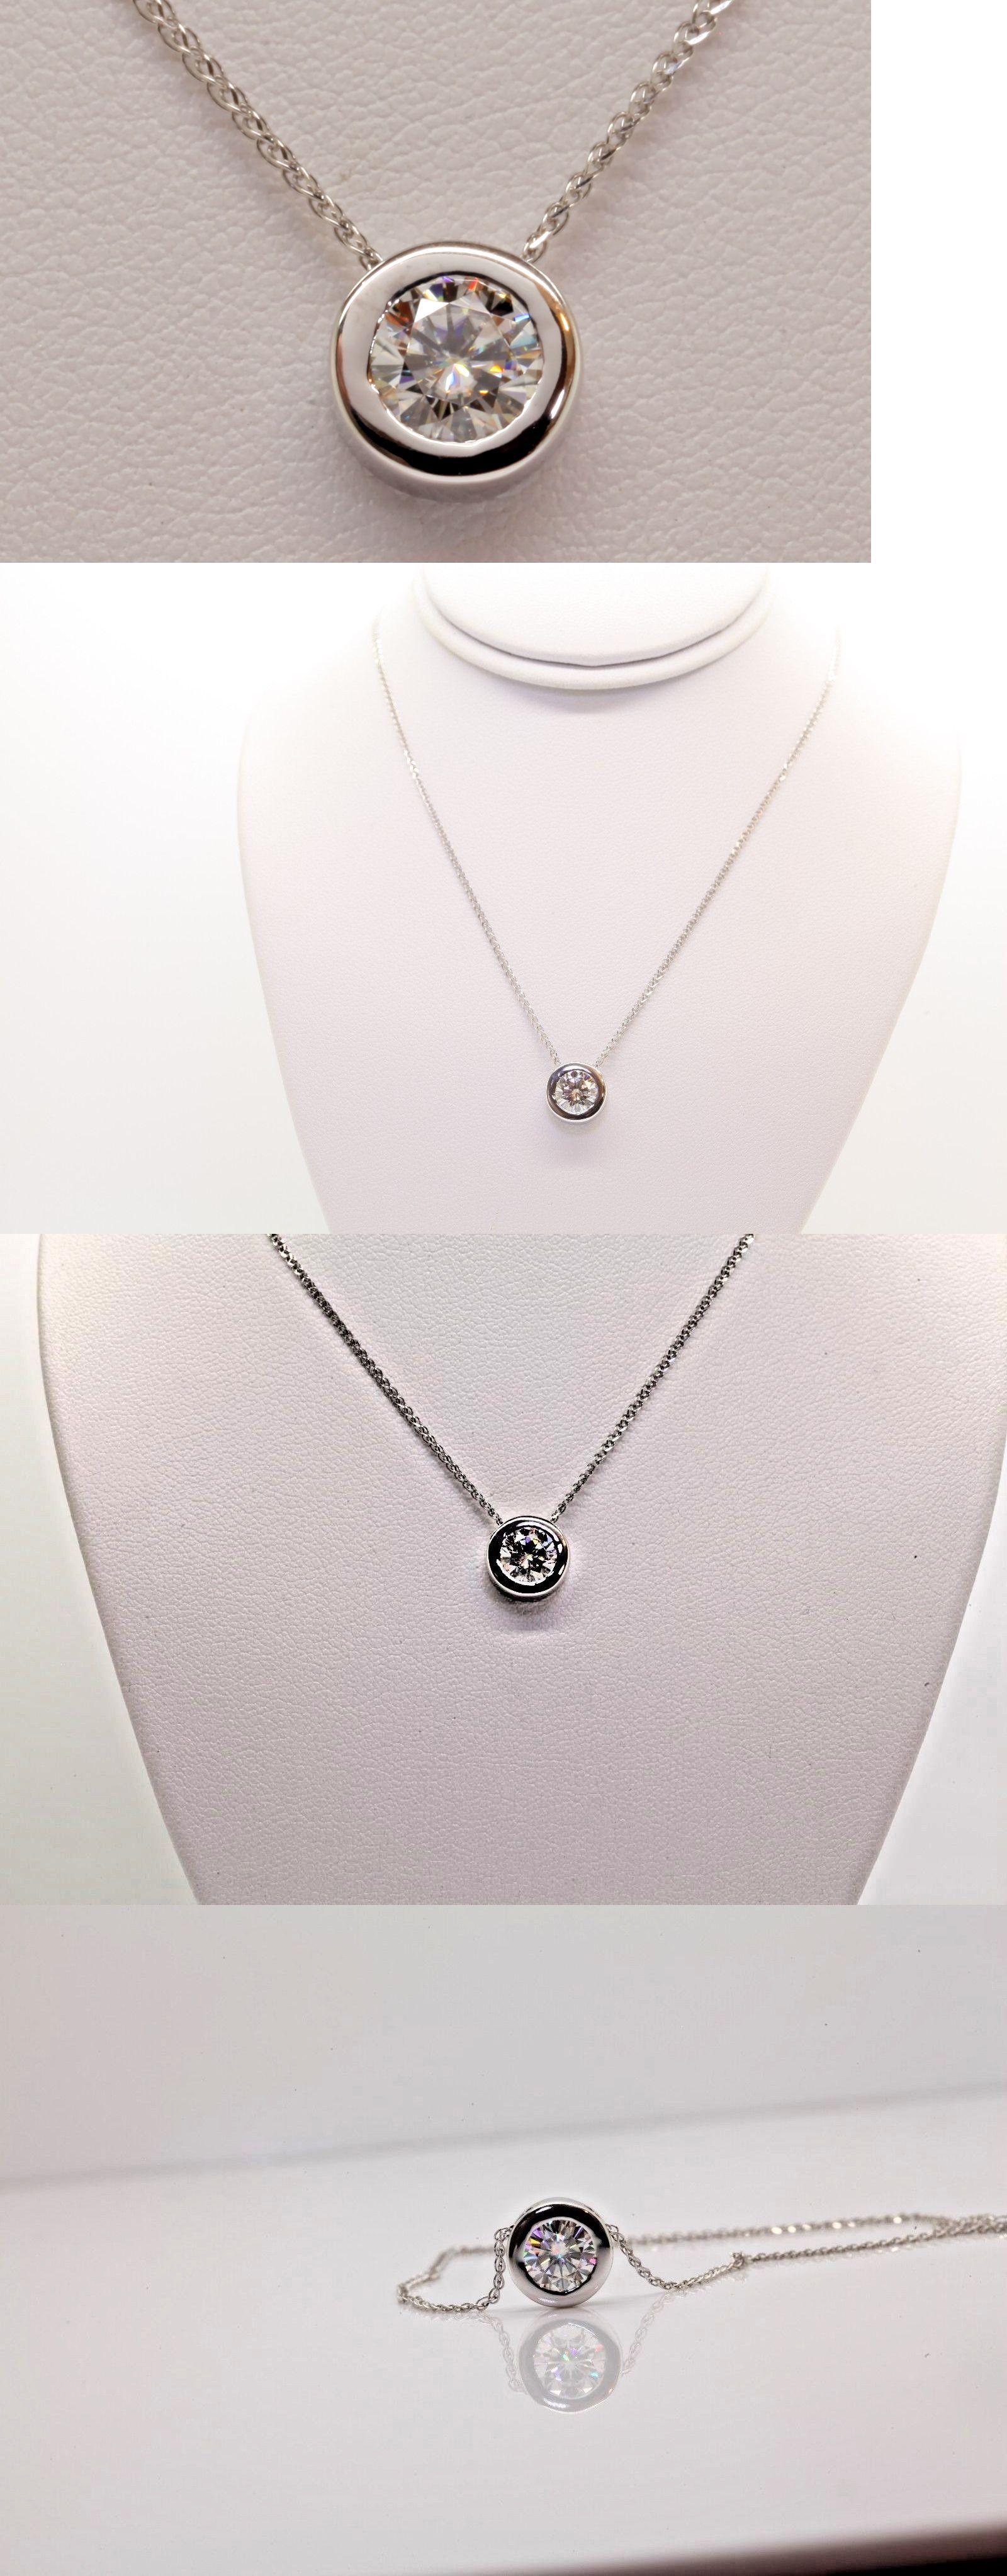 Ct moissanite round pendant necklace bezel set k white gold in